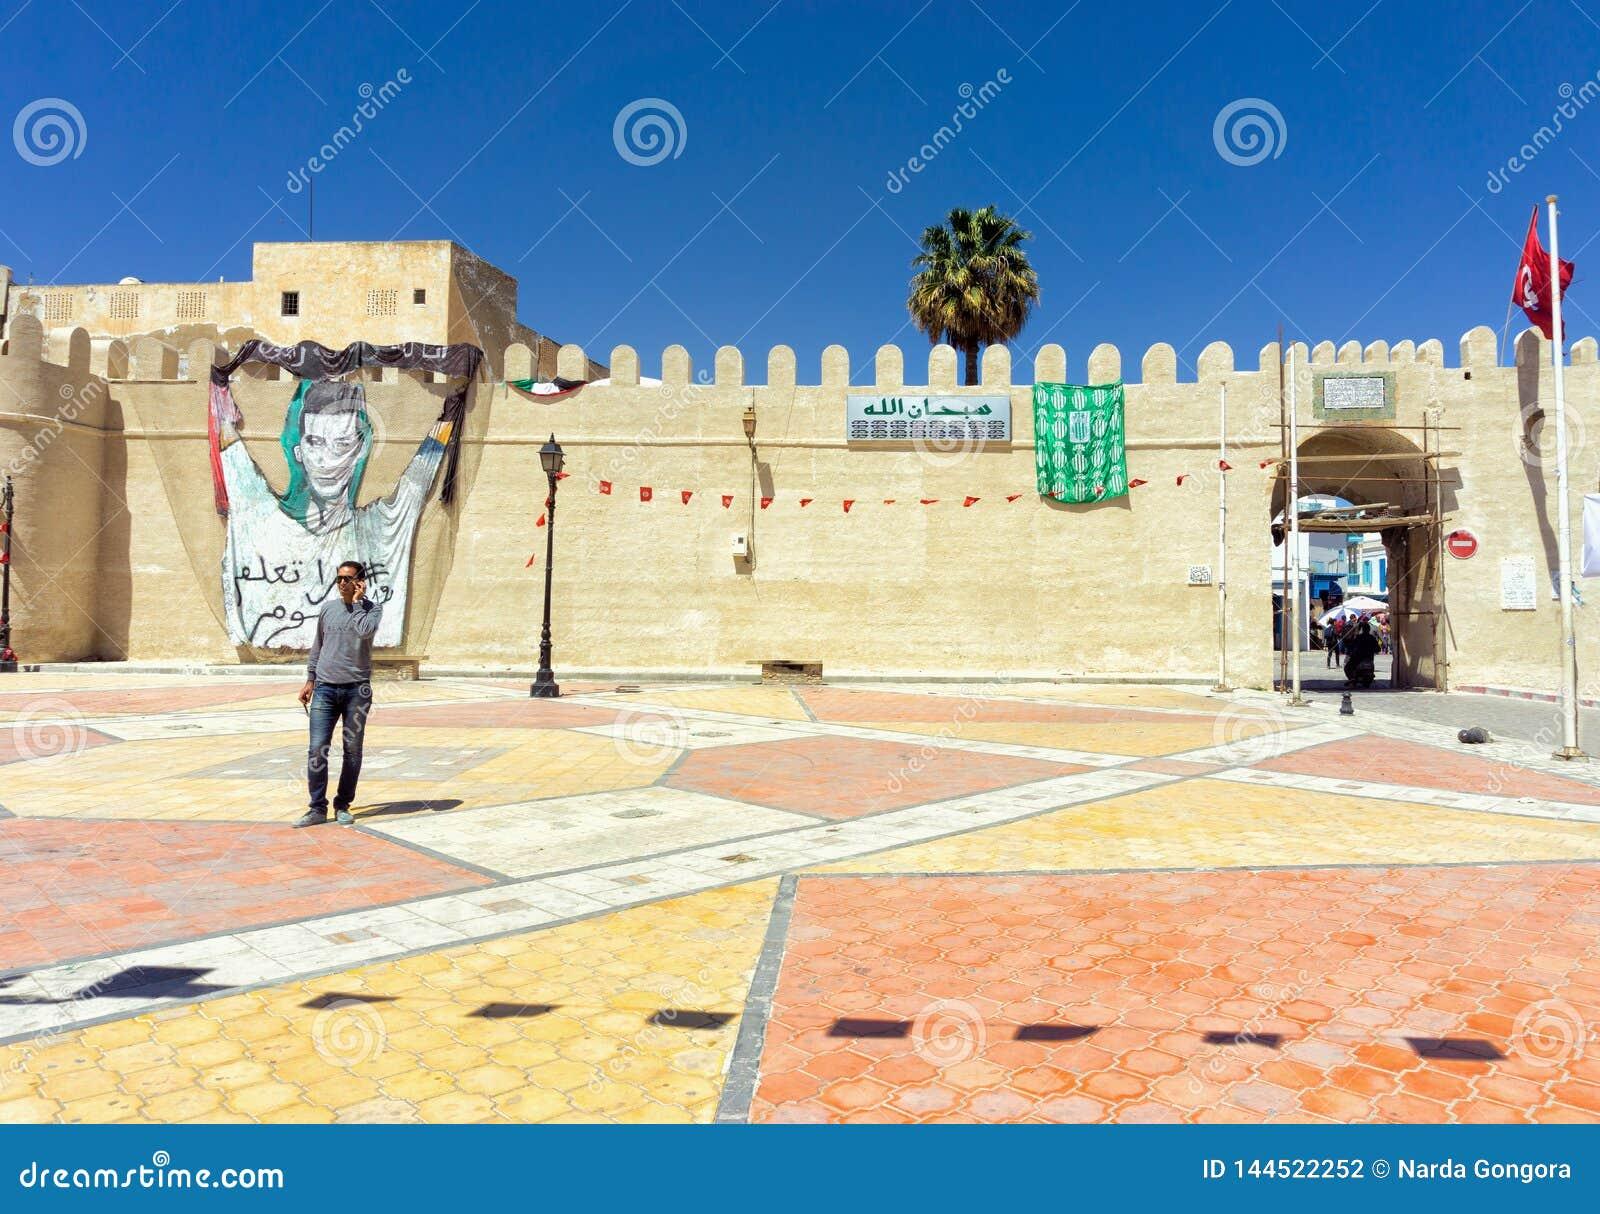 Entrance to the Medina of Kairouan, Tunisia